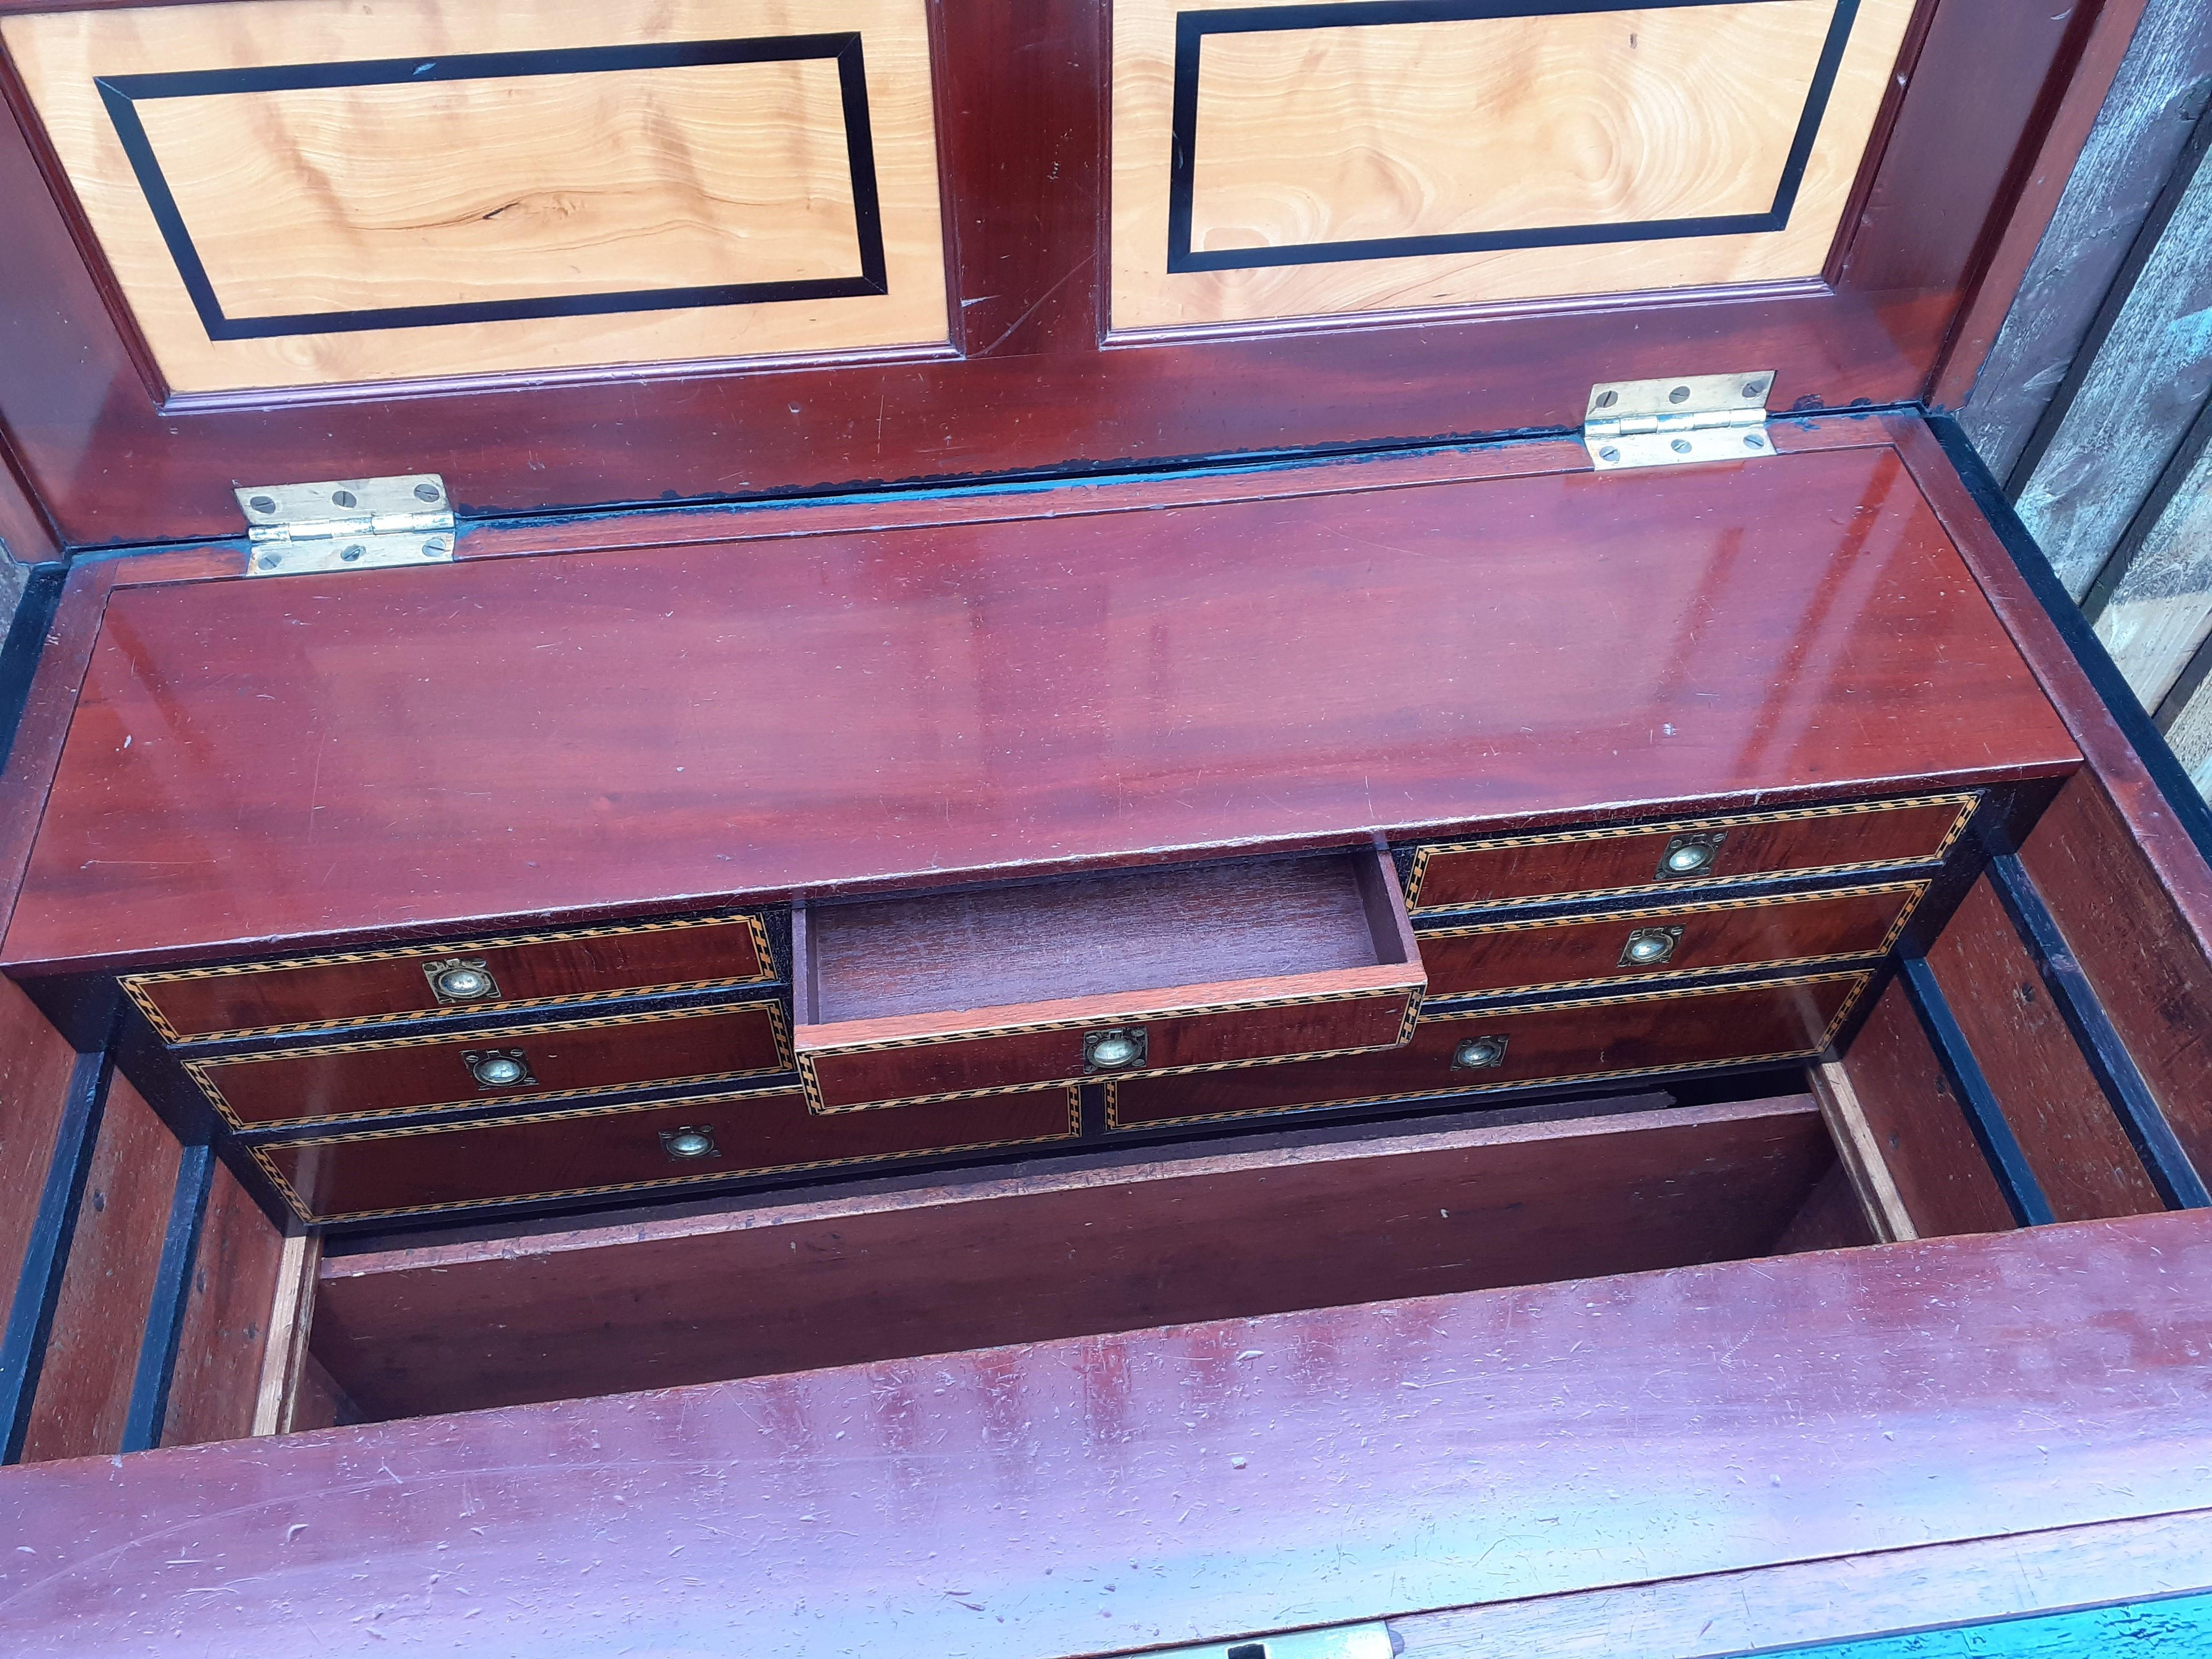 Sheard, Binnington & Co Cabinet Makers Chest